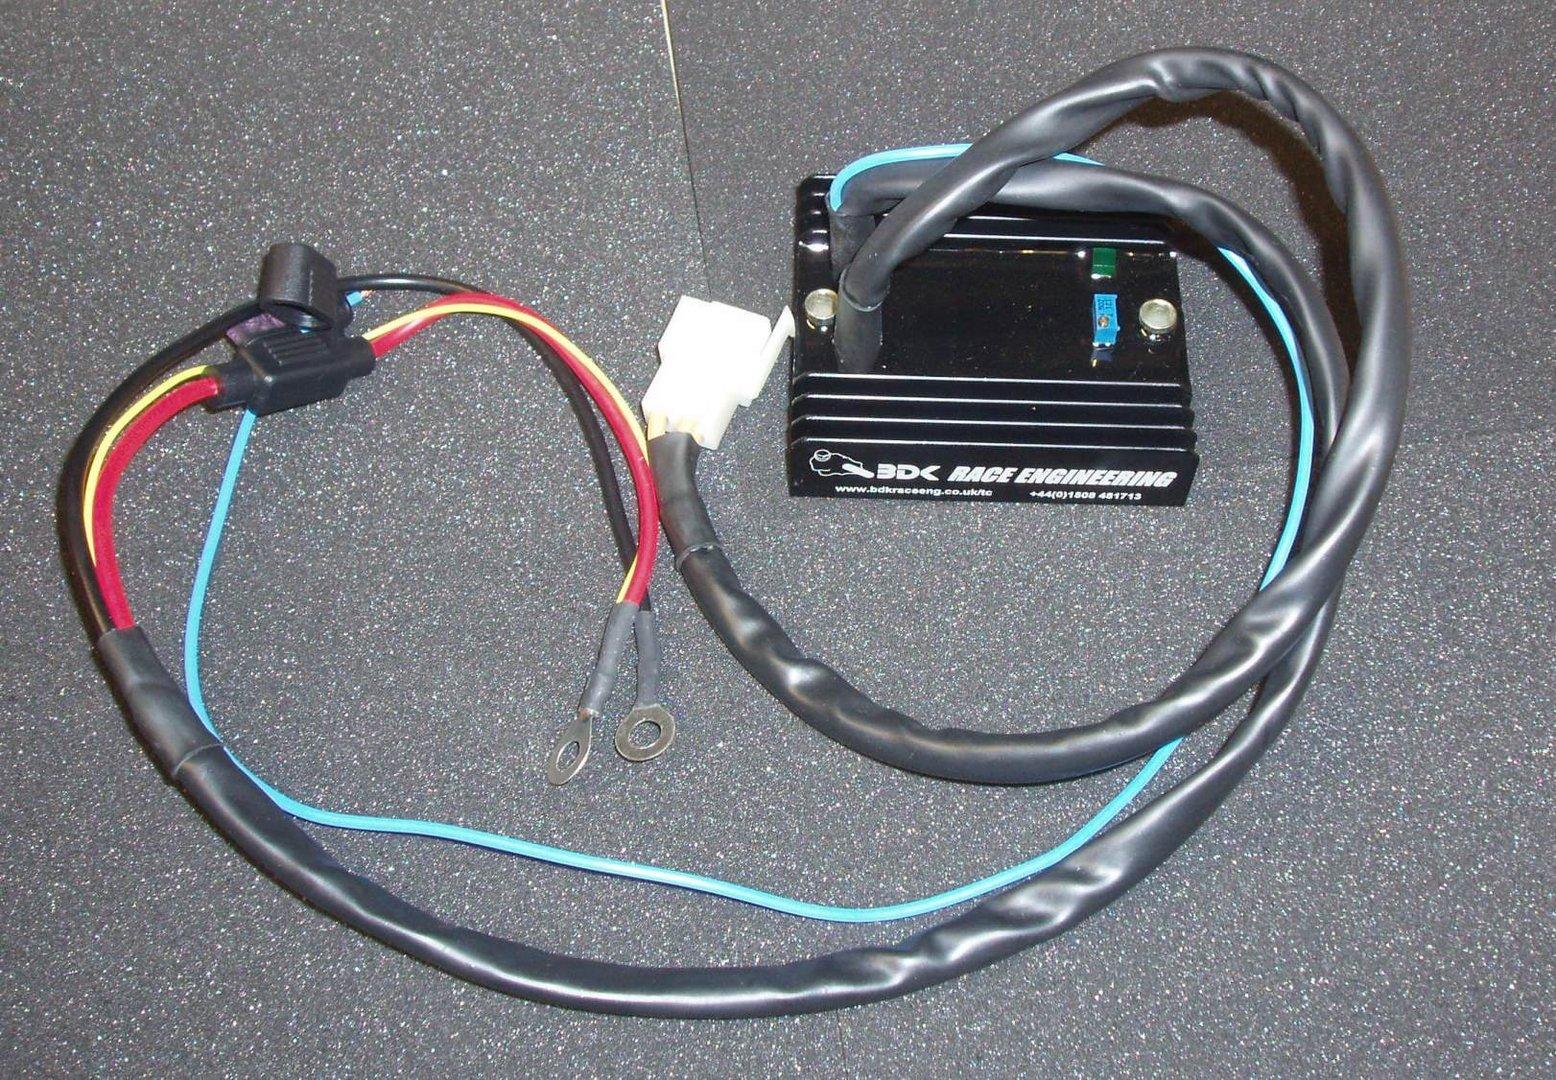 Zx6r 07 Race Racing Alternator Generator Wiring Harness For Kawasaki 636 Genartor Kit